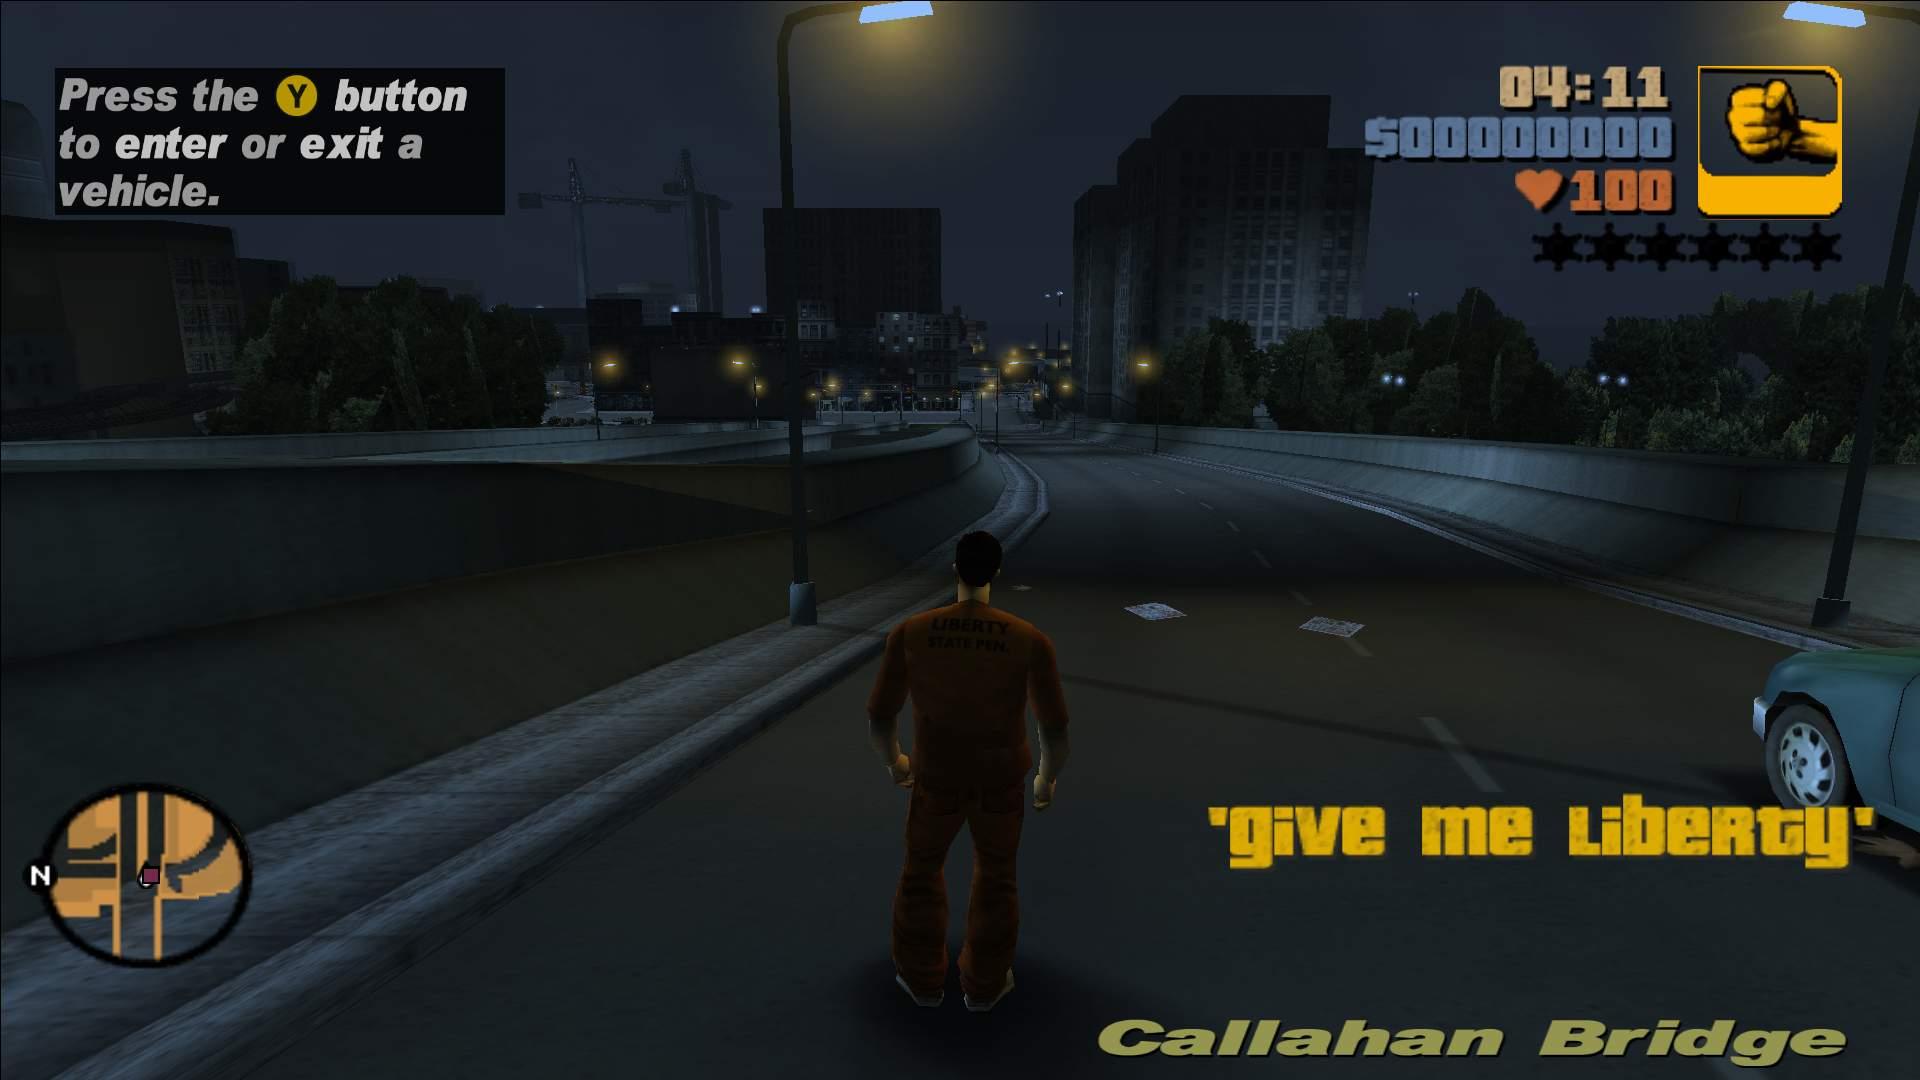 gta 3 android game zip file download